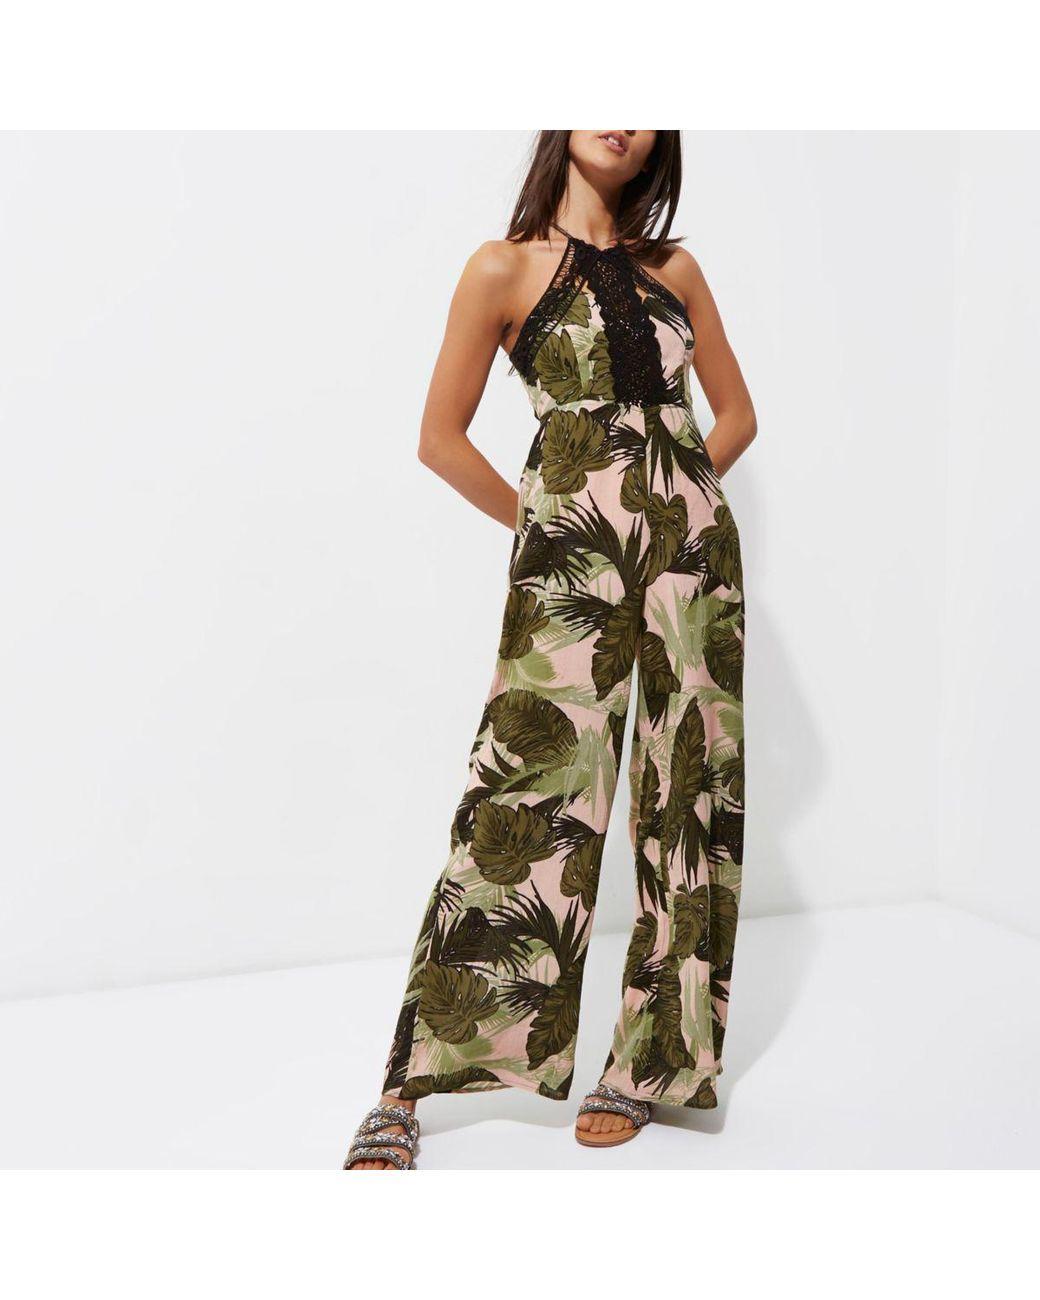 93b408c25a3 Women s Green Leaf Print Crochet Beach Jumpsuit